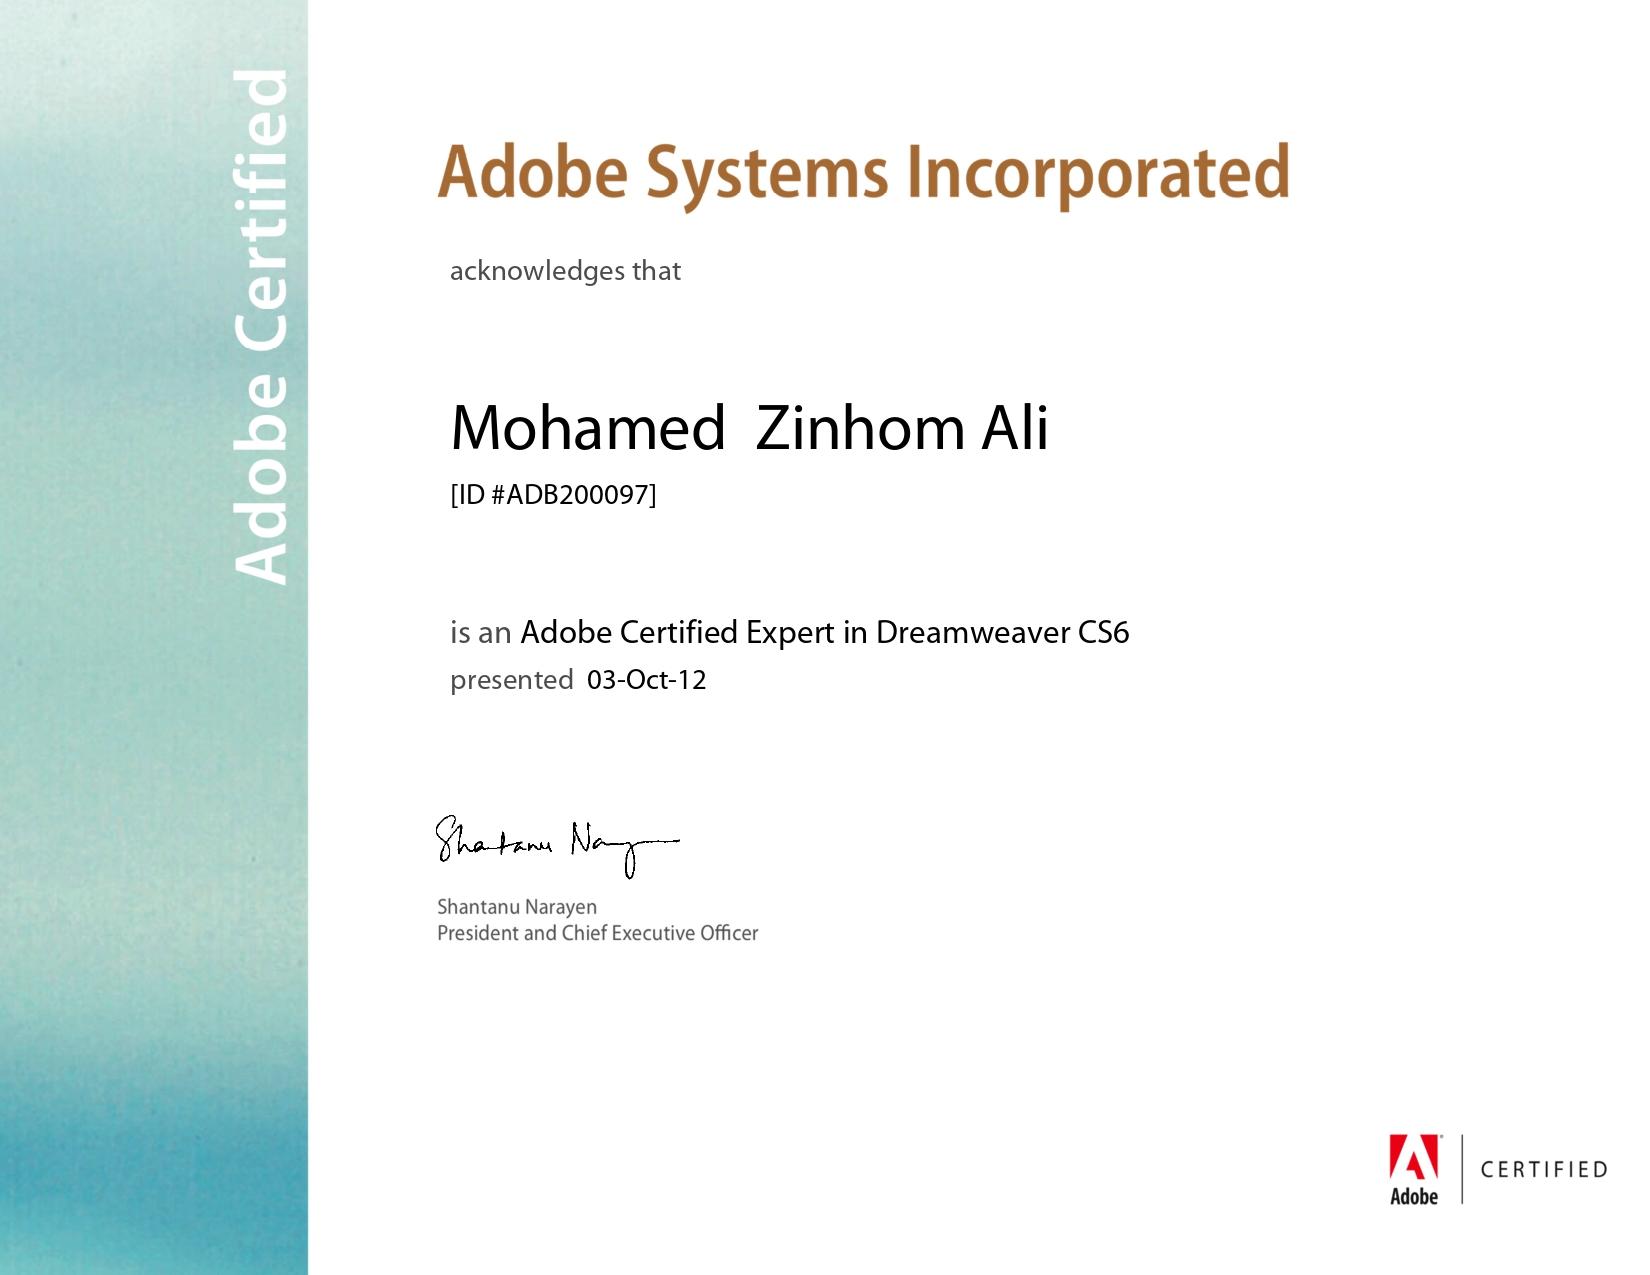 Adobe Certified Expert Dreamweaver CS6